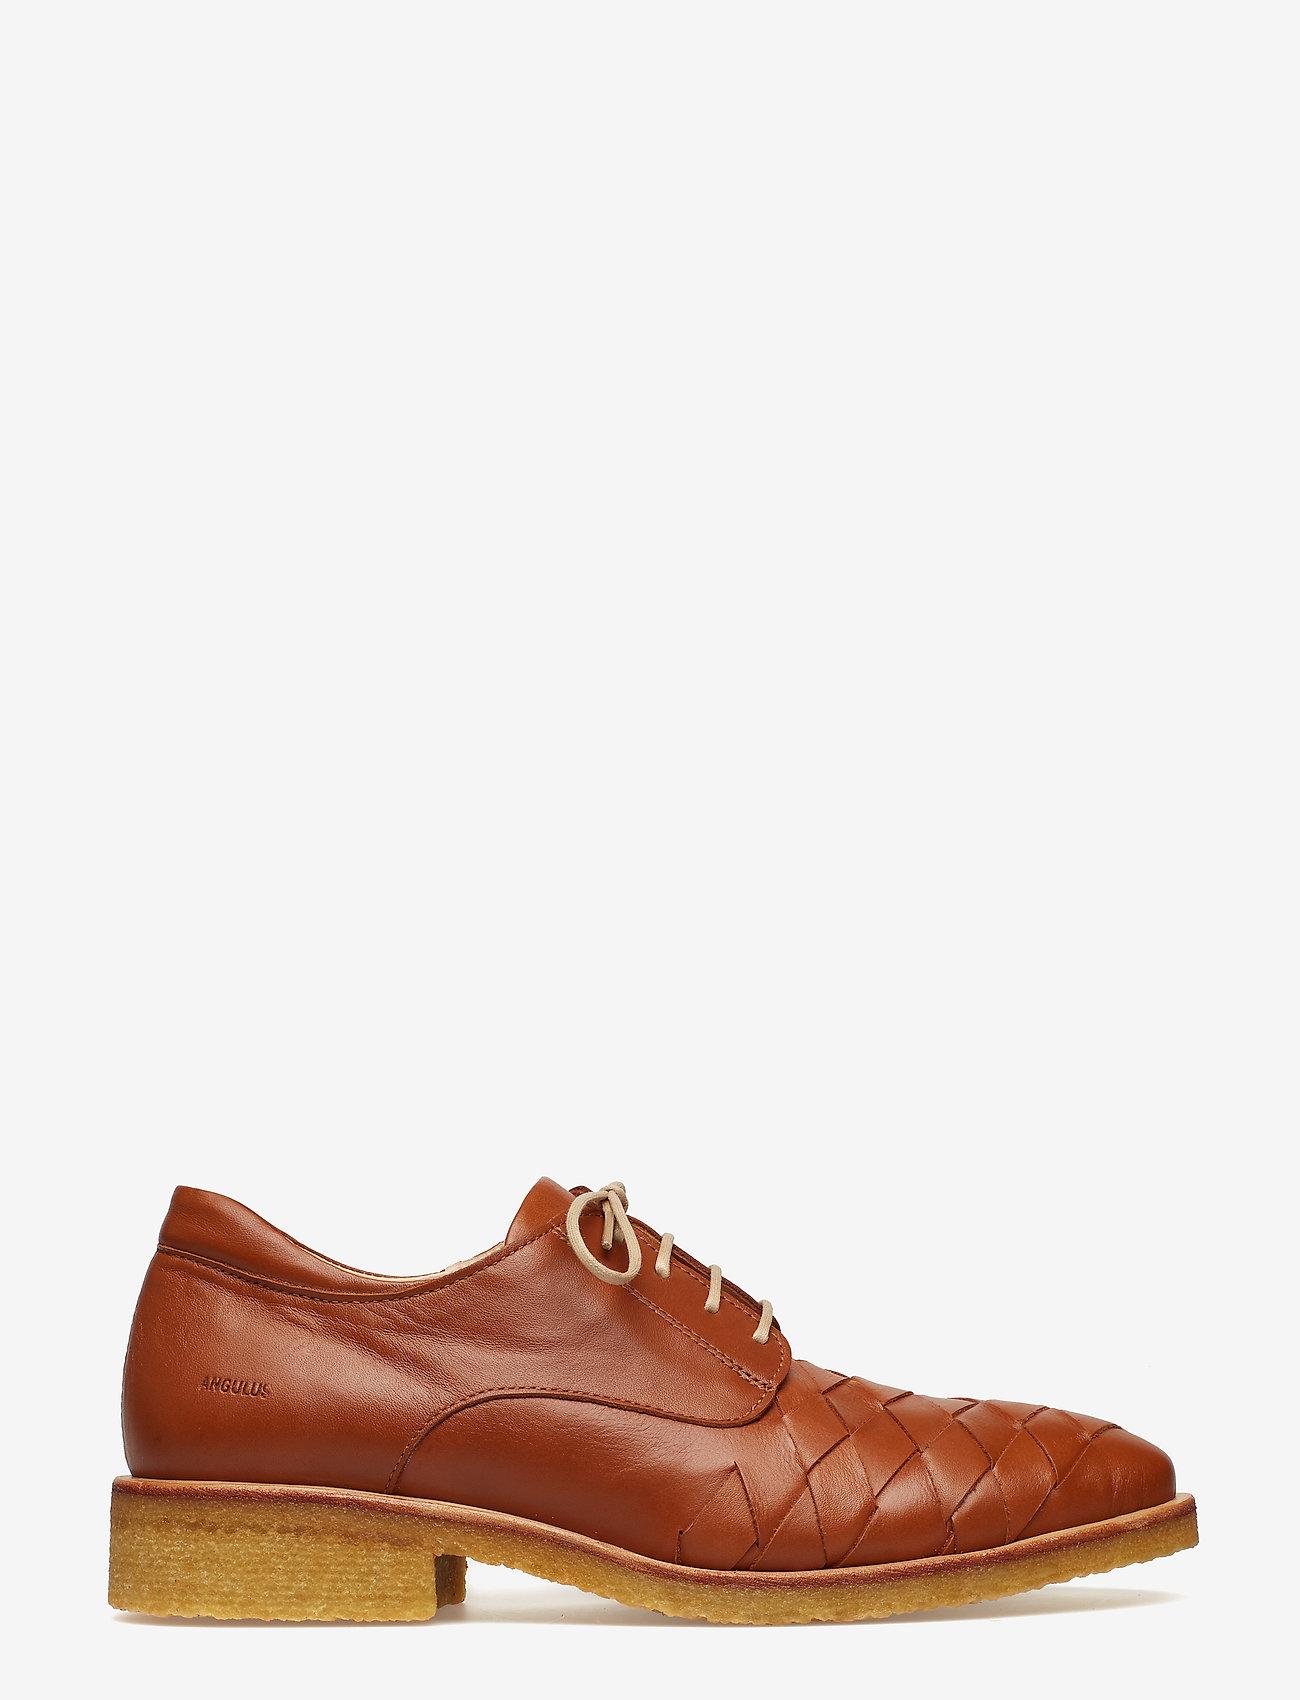 ANGULUS - Shoes - flat - 1838 cognac - 1